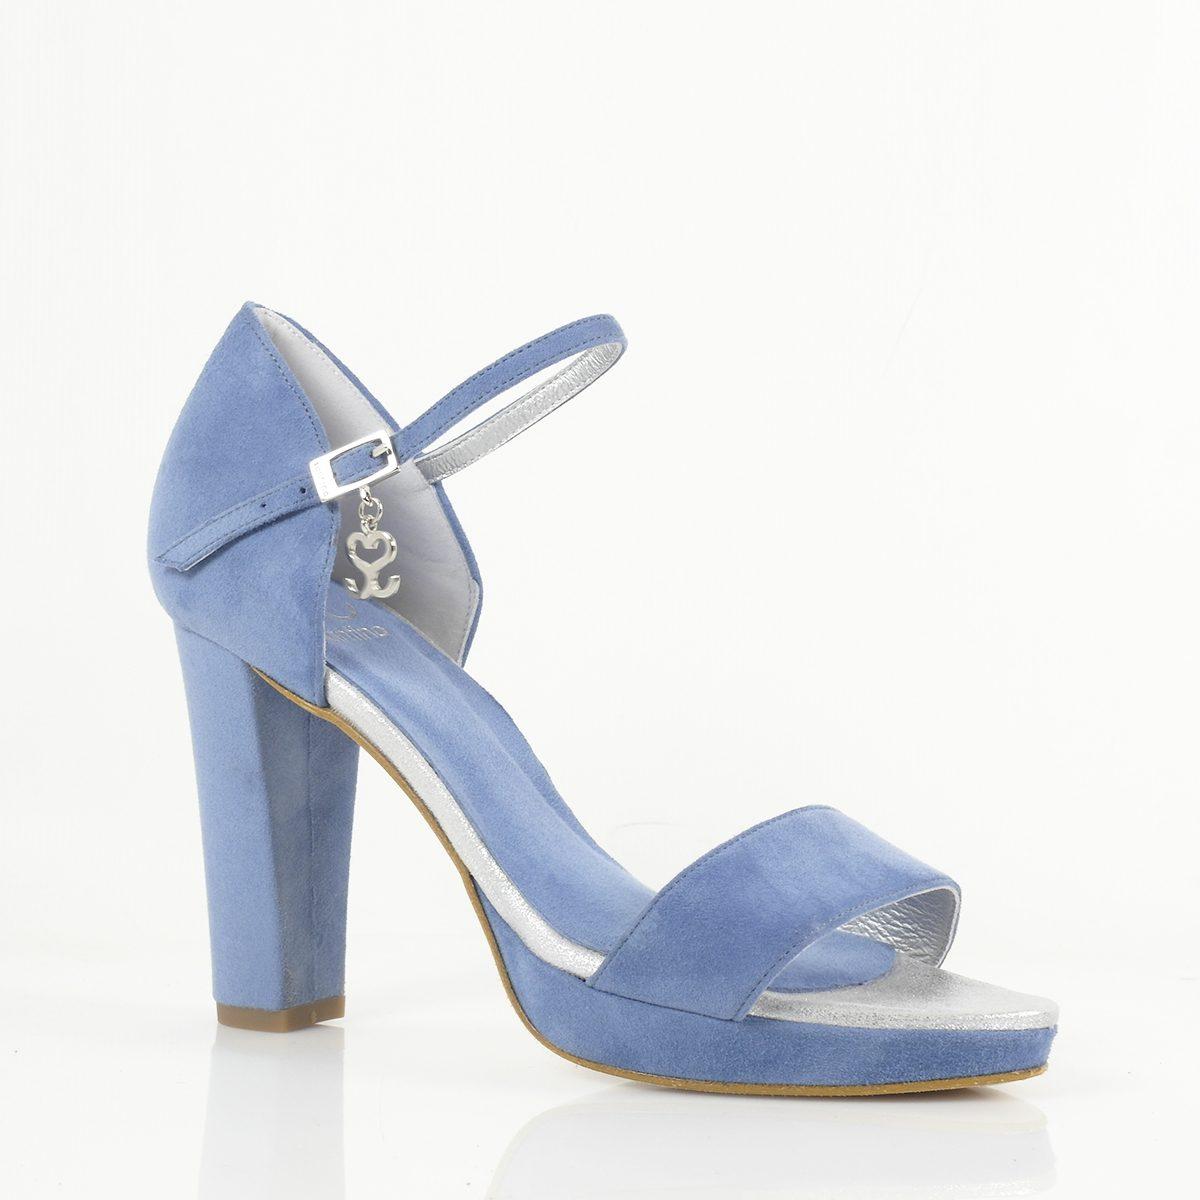 SANDALIA MOD.1378 (10cm) - zapatos personalizados fiesta